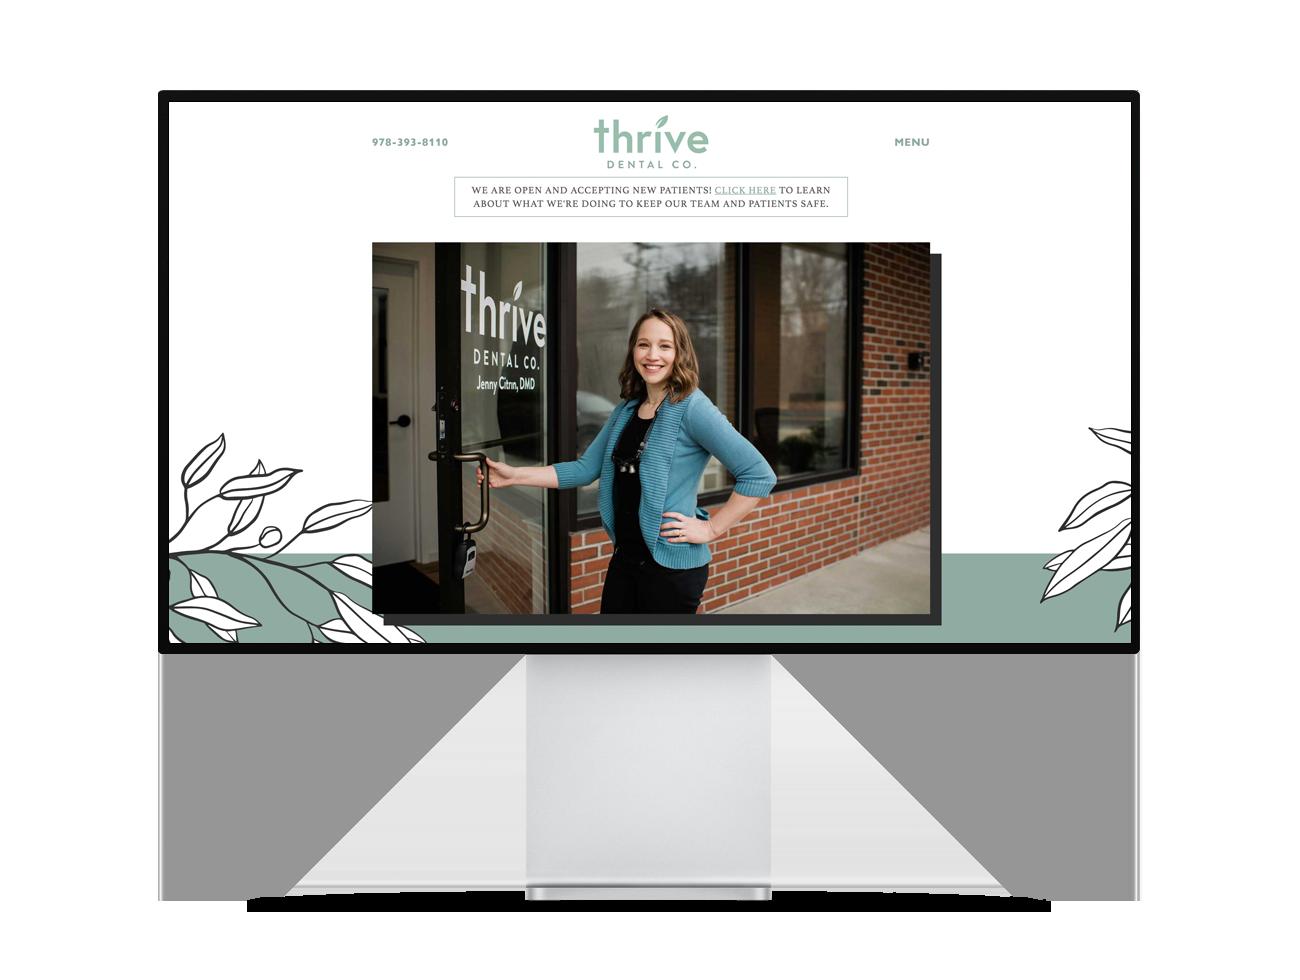 Screenshot of the Thrive Dental Co. homepage